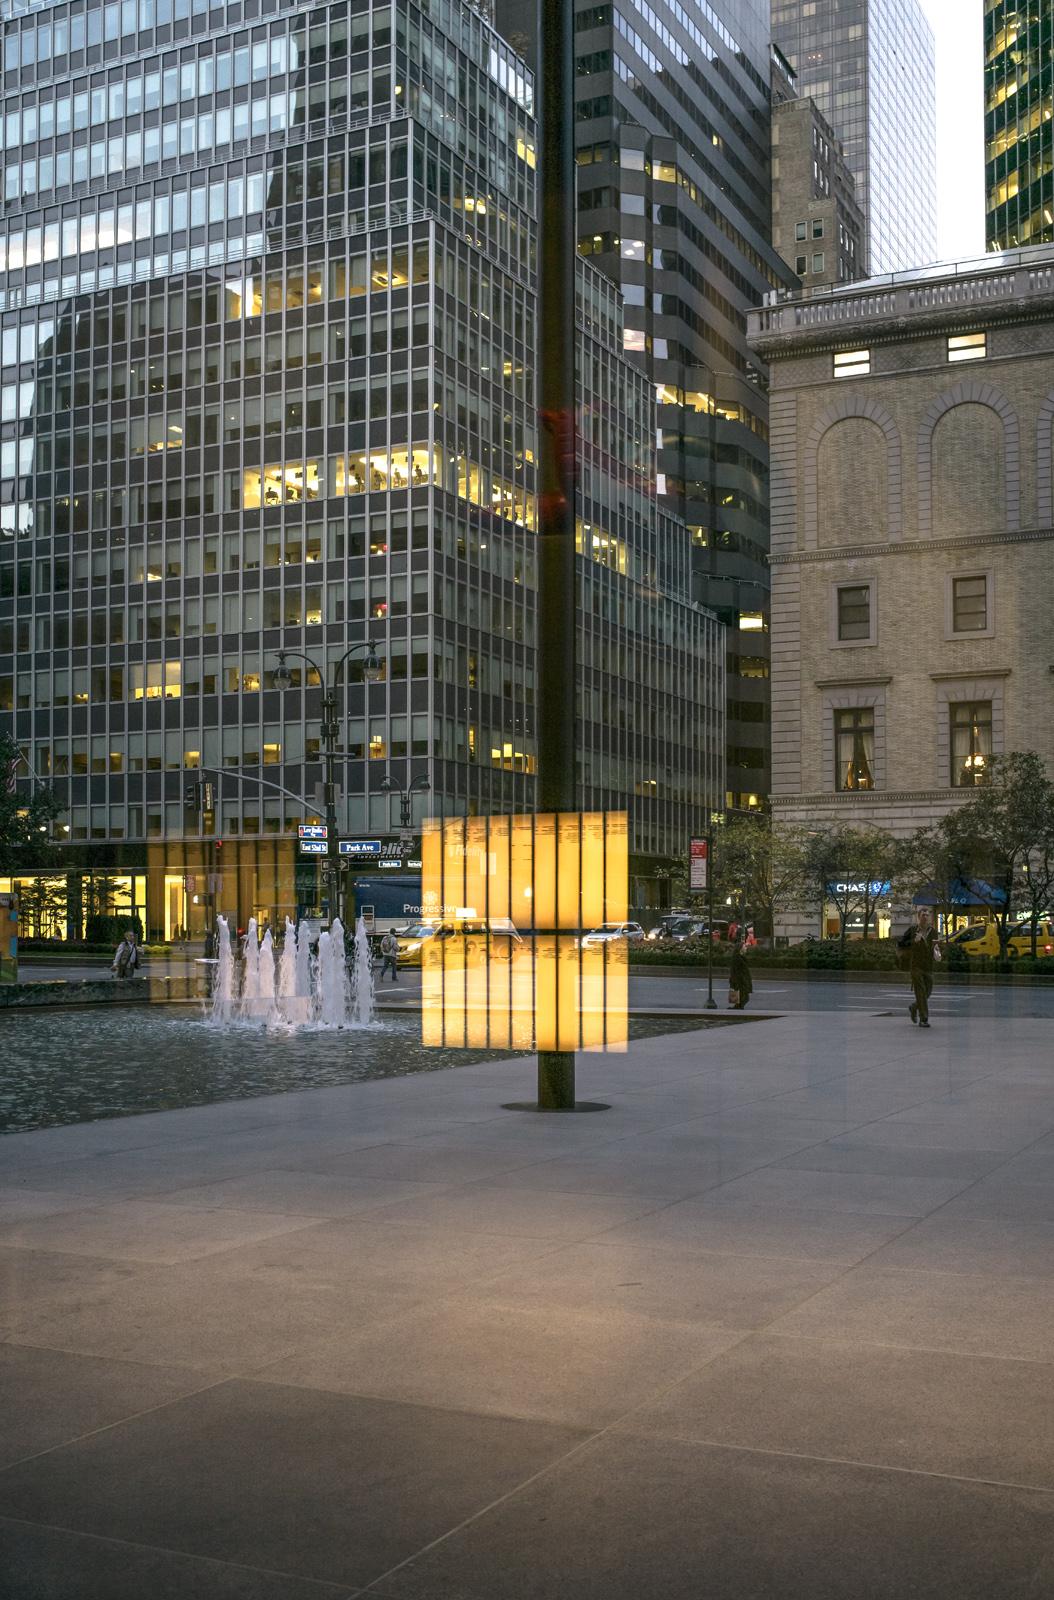 Seagram Building 8 New York 2016